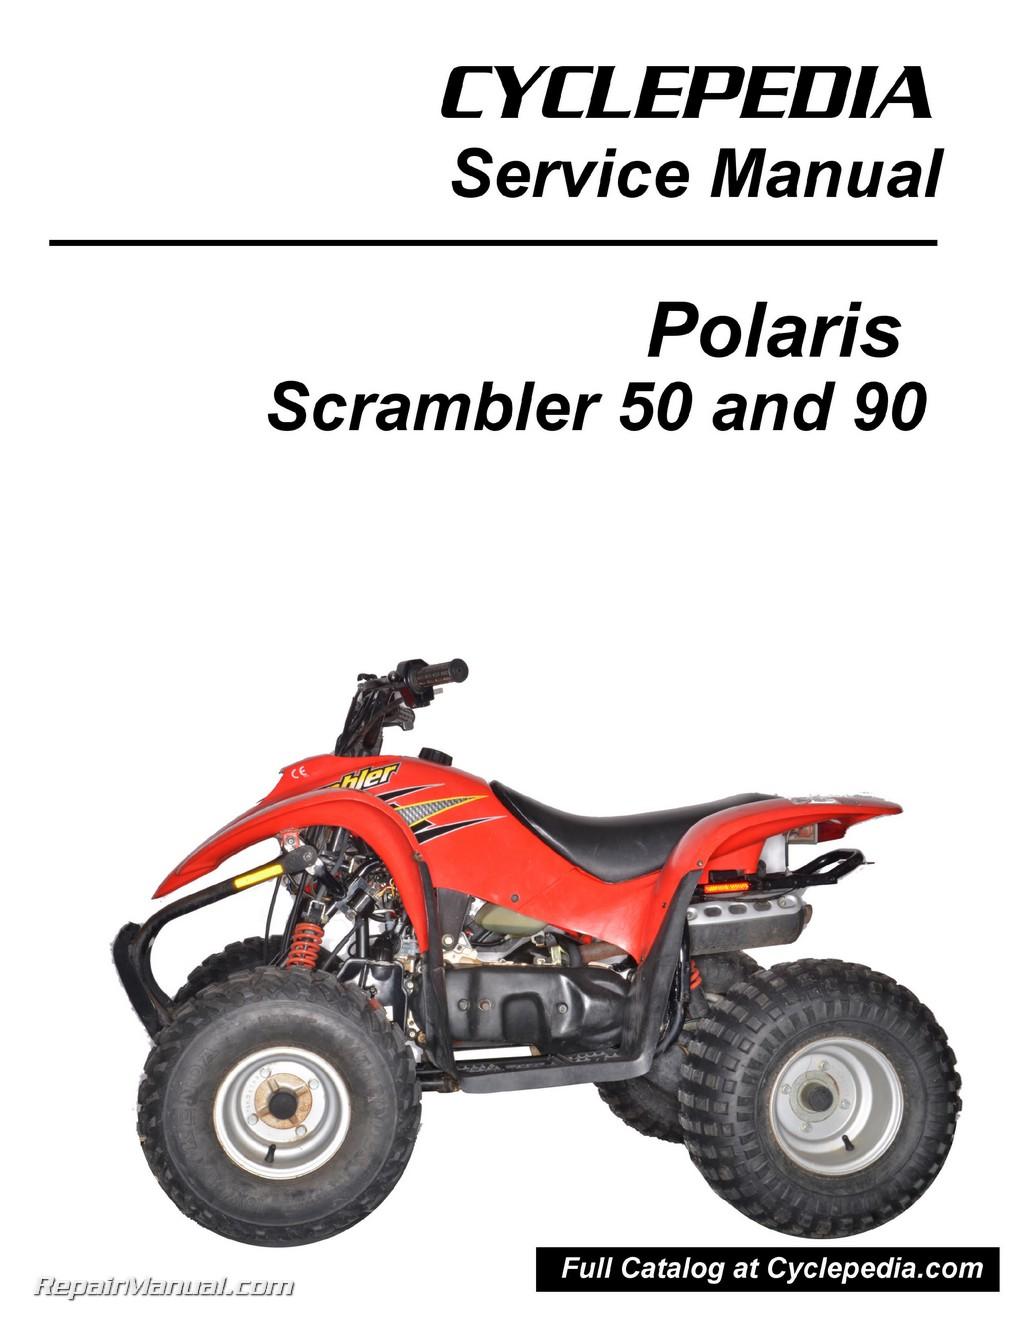 polaris scrambler 90 service manual pdf autos post. Black Bedroom Furniture Sets. Home Design Ideas